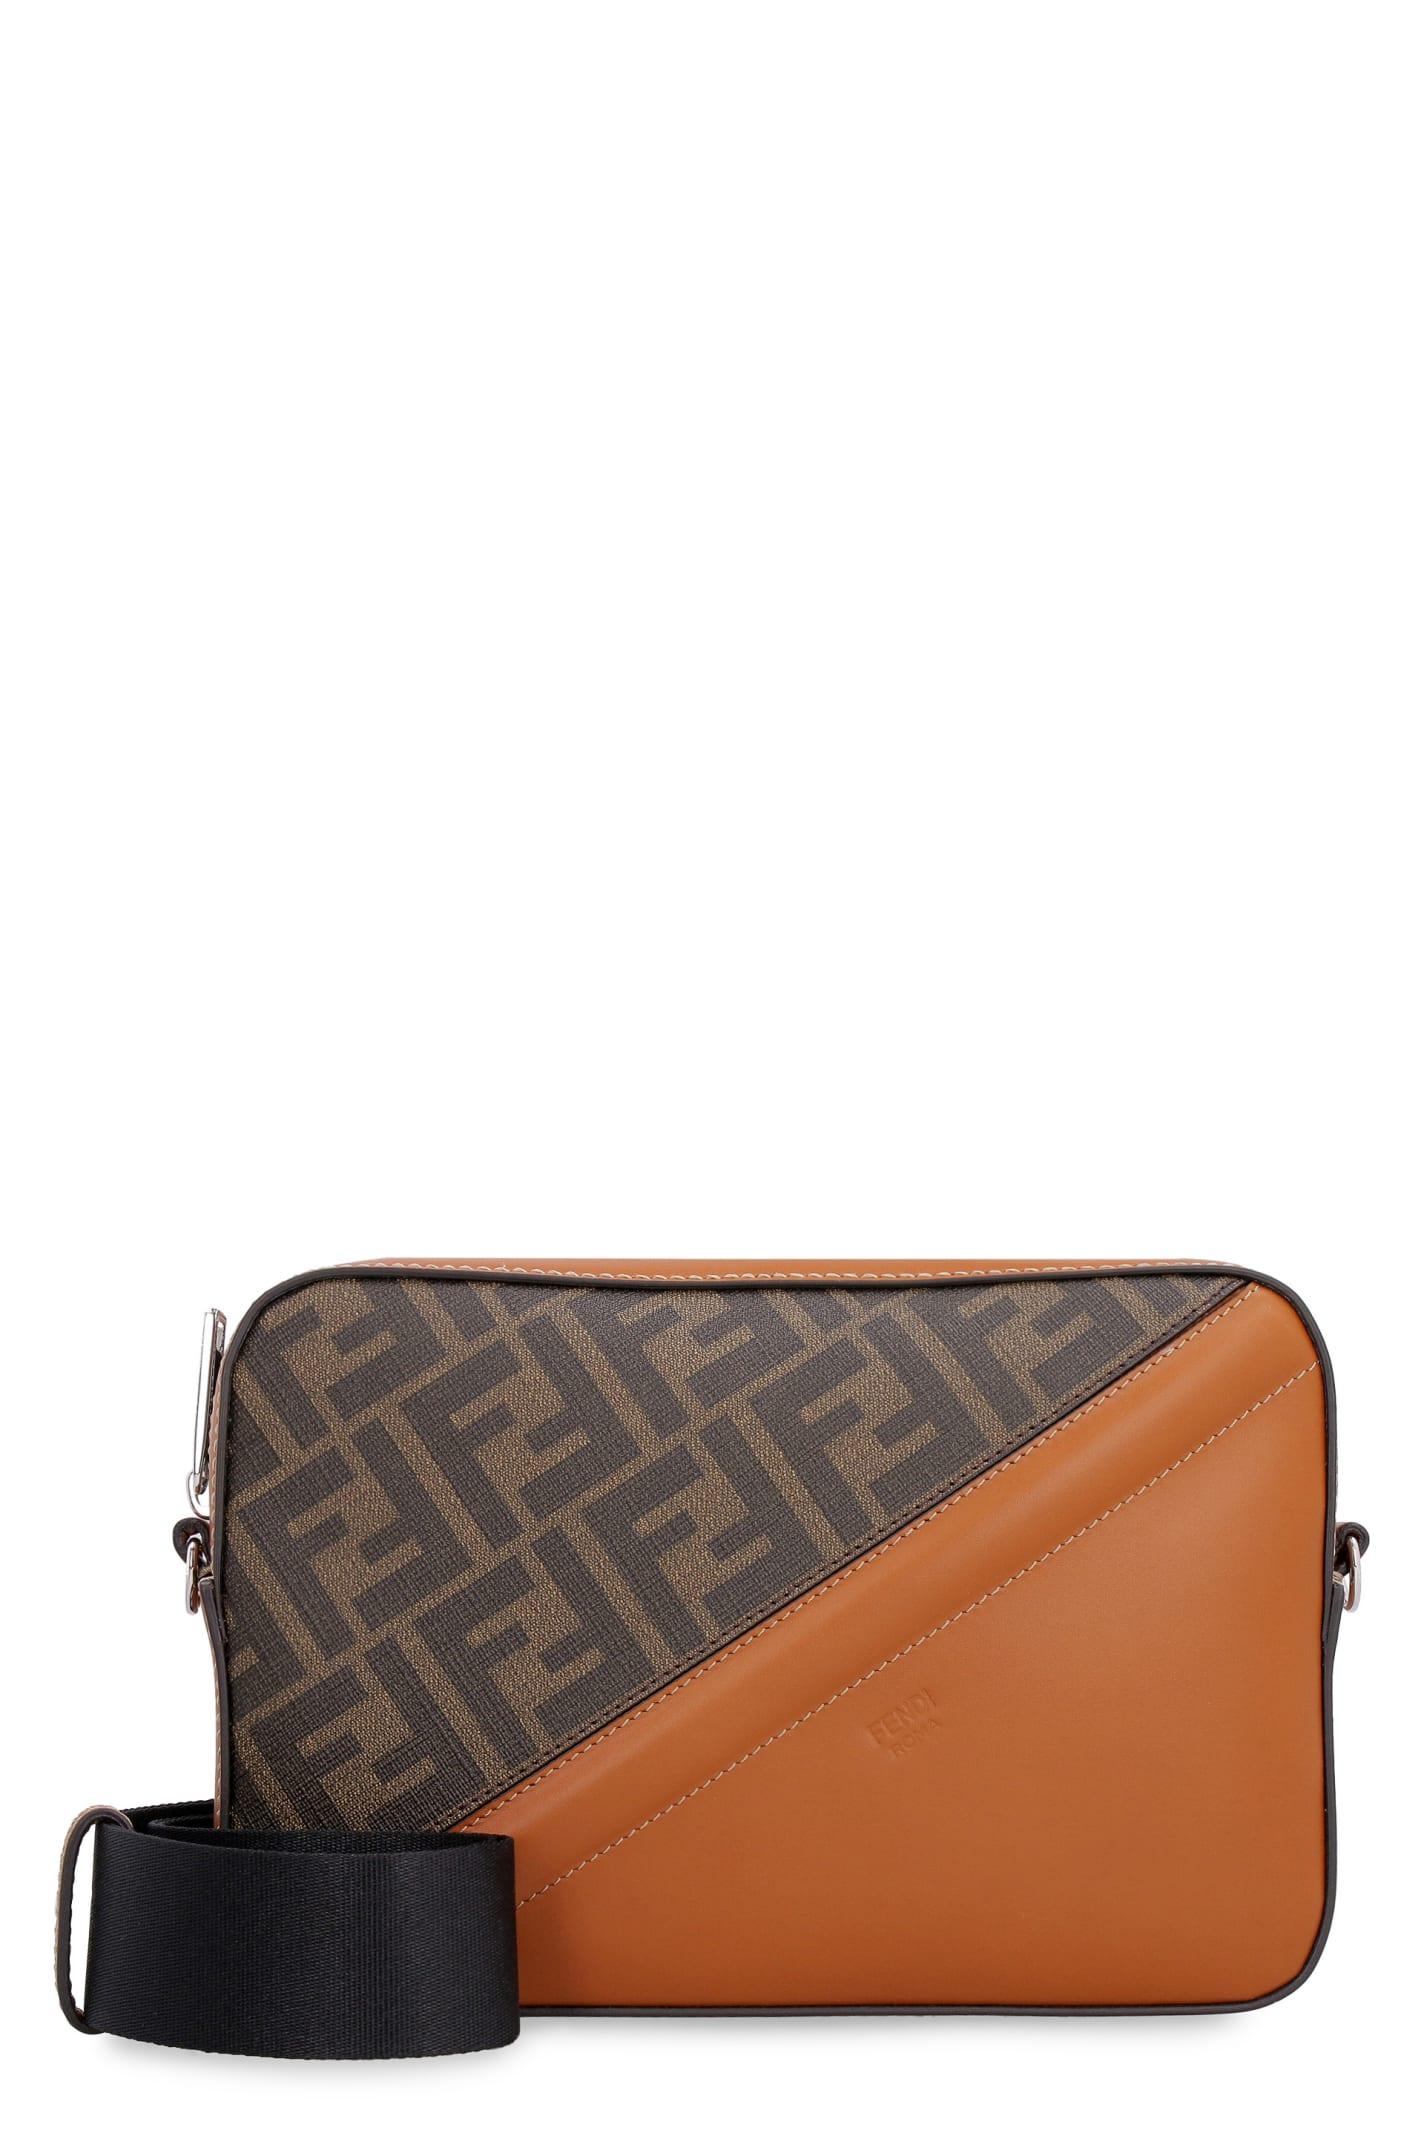 Fendi Leathers CAMERA CASE MEDIUM FABRIC SHOULDER BAG